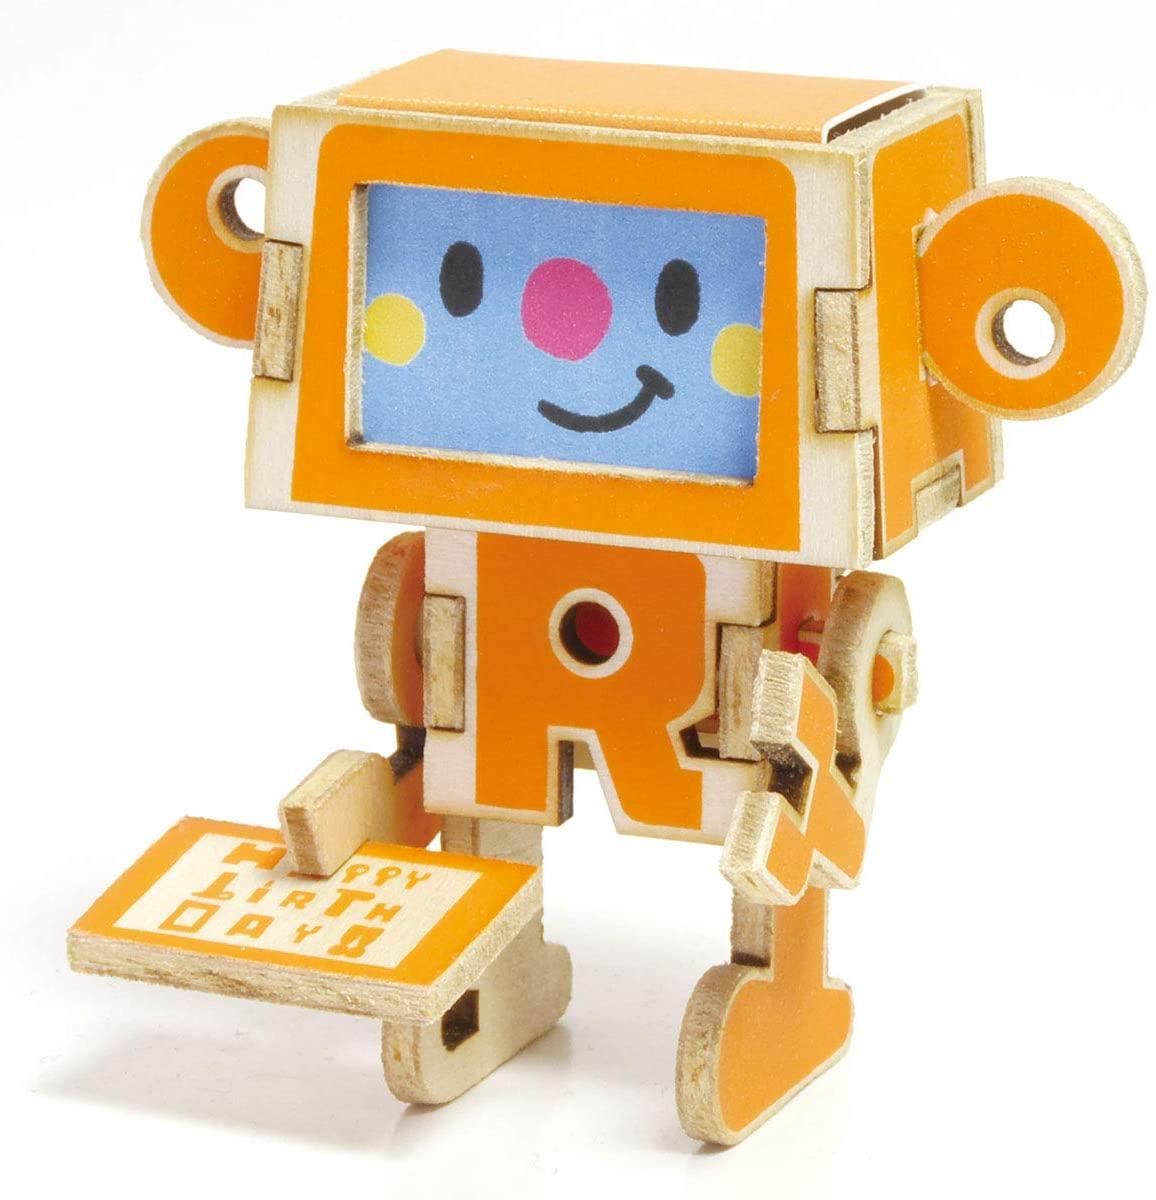 PLAYDECO DIY Happy Birthday Card - Wooden 3D Pop Up Robot Greeting Card (Happy Birthday Orange)